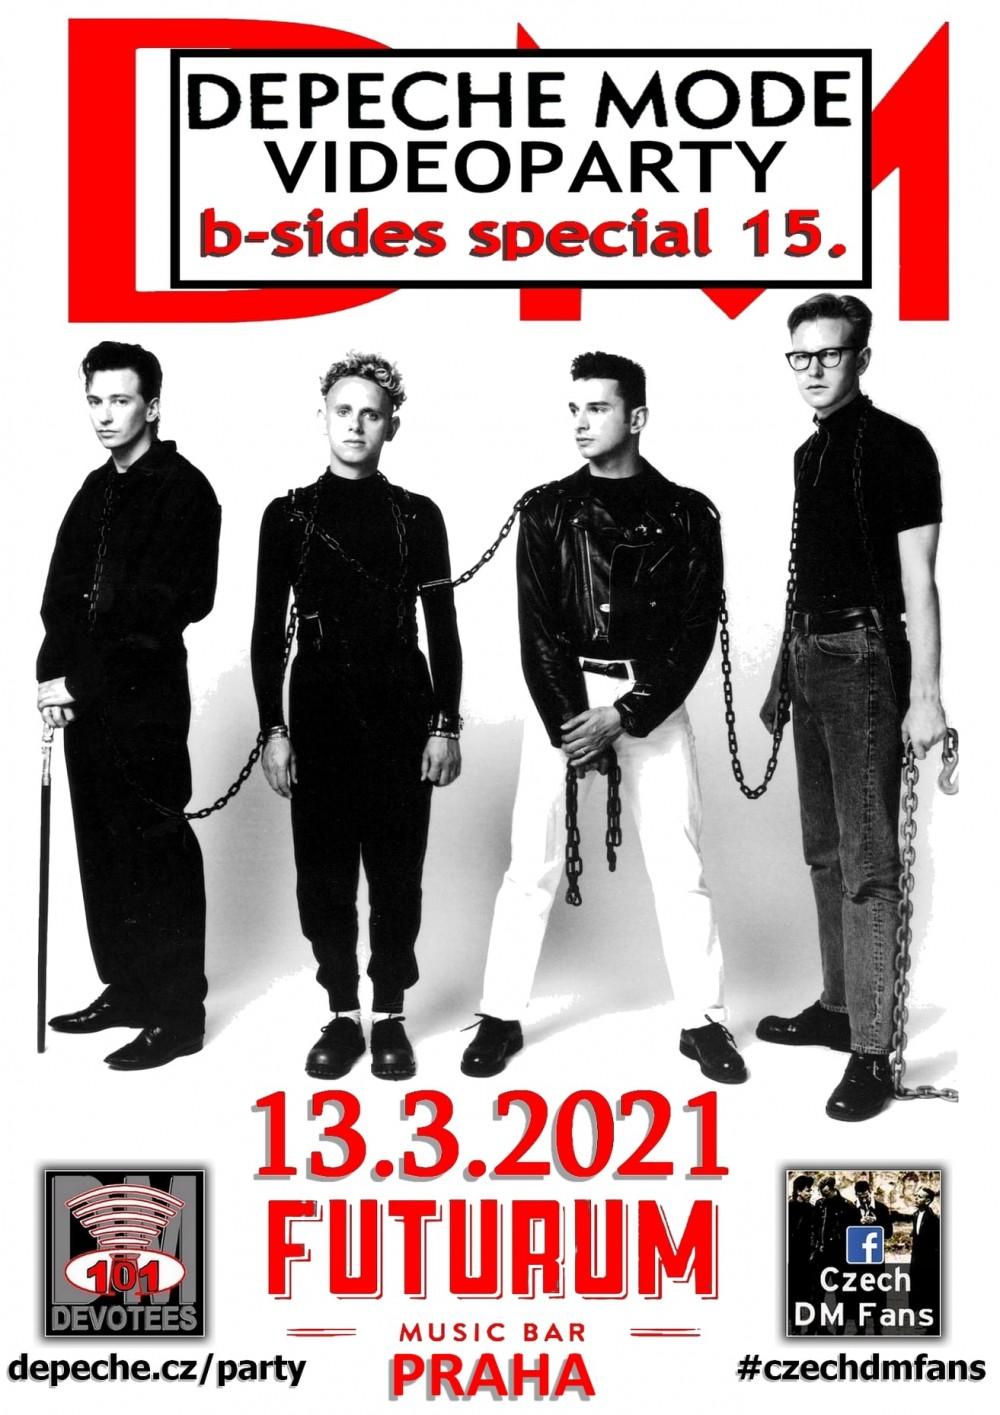 Praha: Depeche Mode B-Sides special 15.